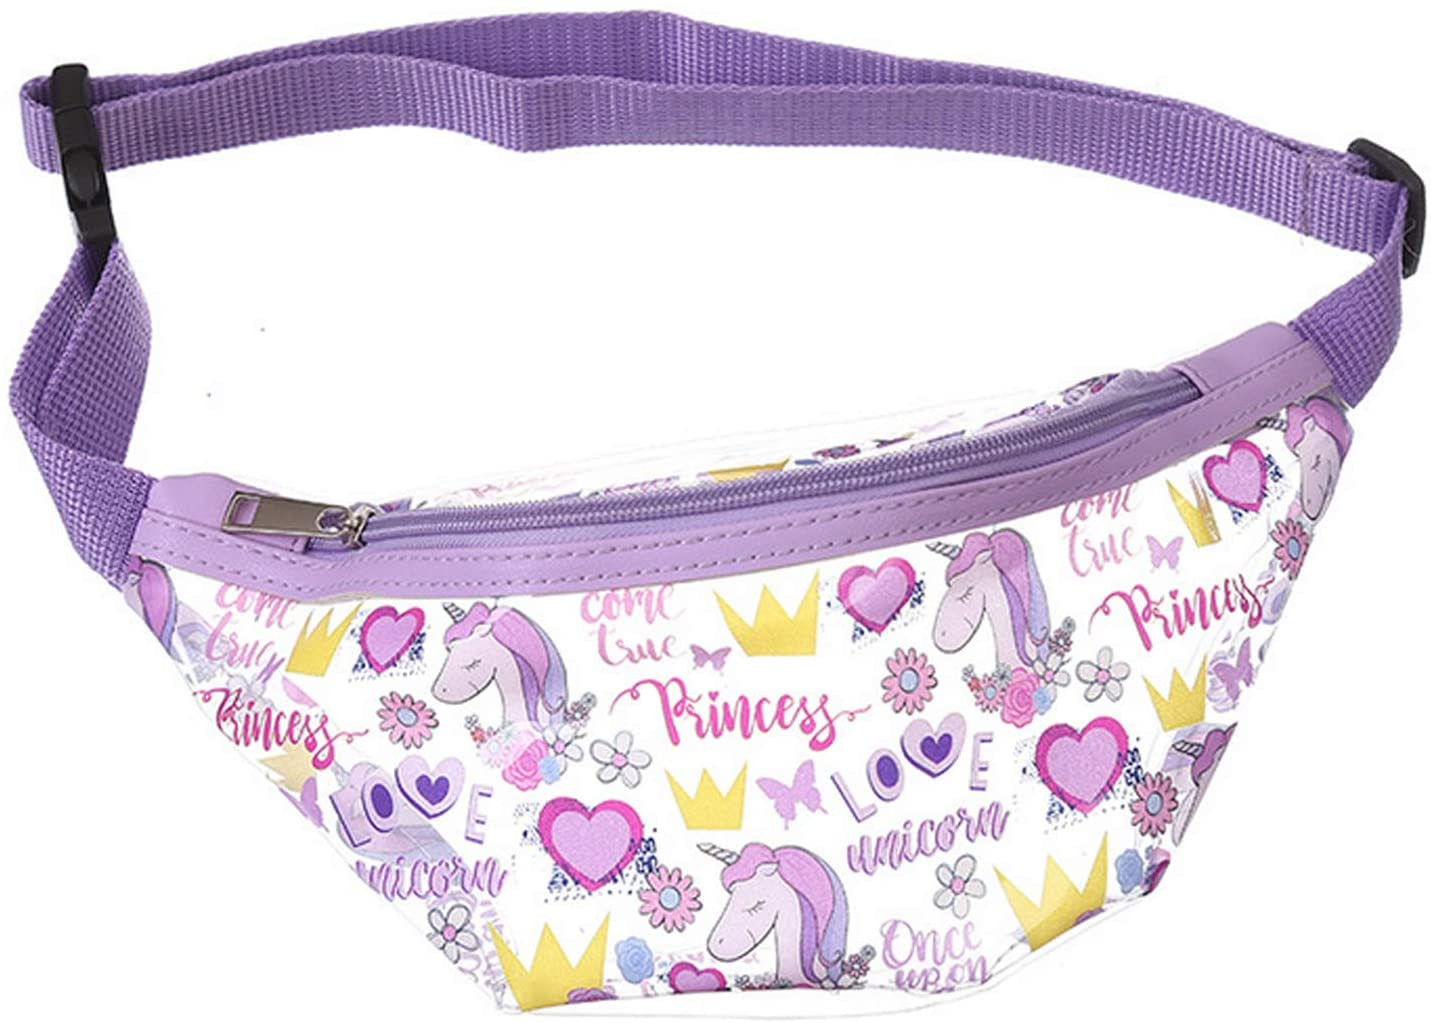 OMLEE Unicorn Sport Waist Bag, Fanny Packs for Girls Women, Transparent PVC Waist Pouch Belt Bag for Walking Running Stadium Concerts